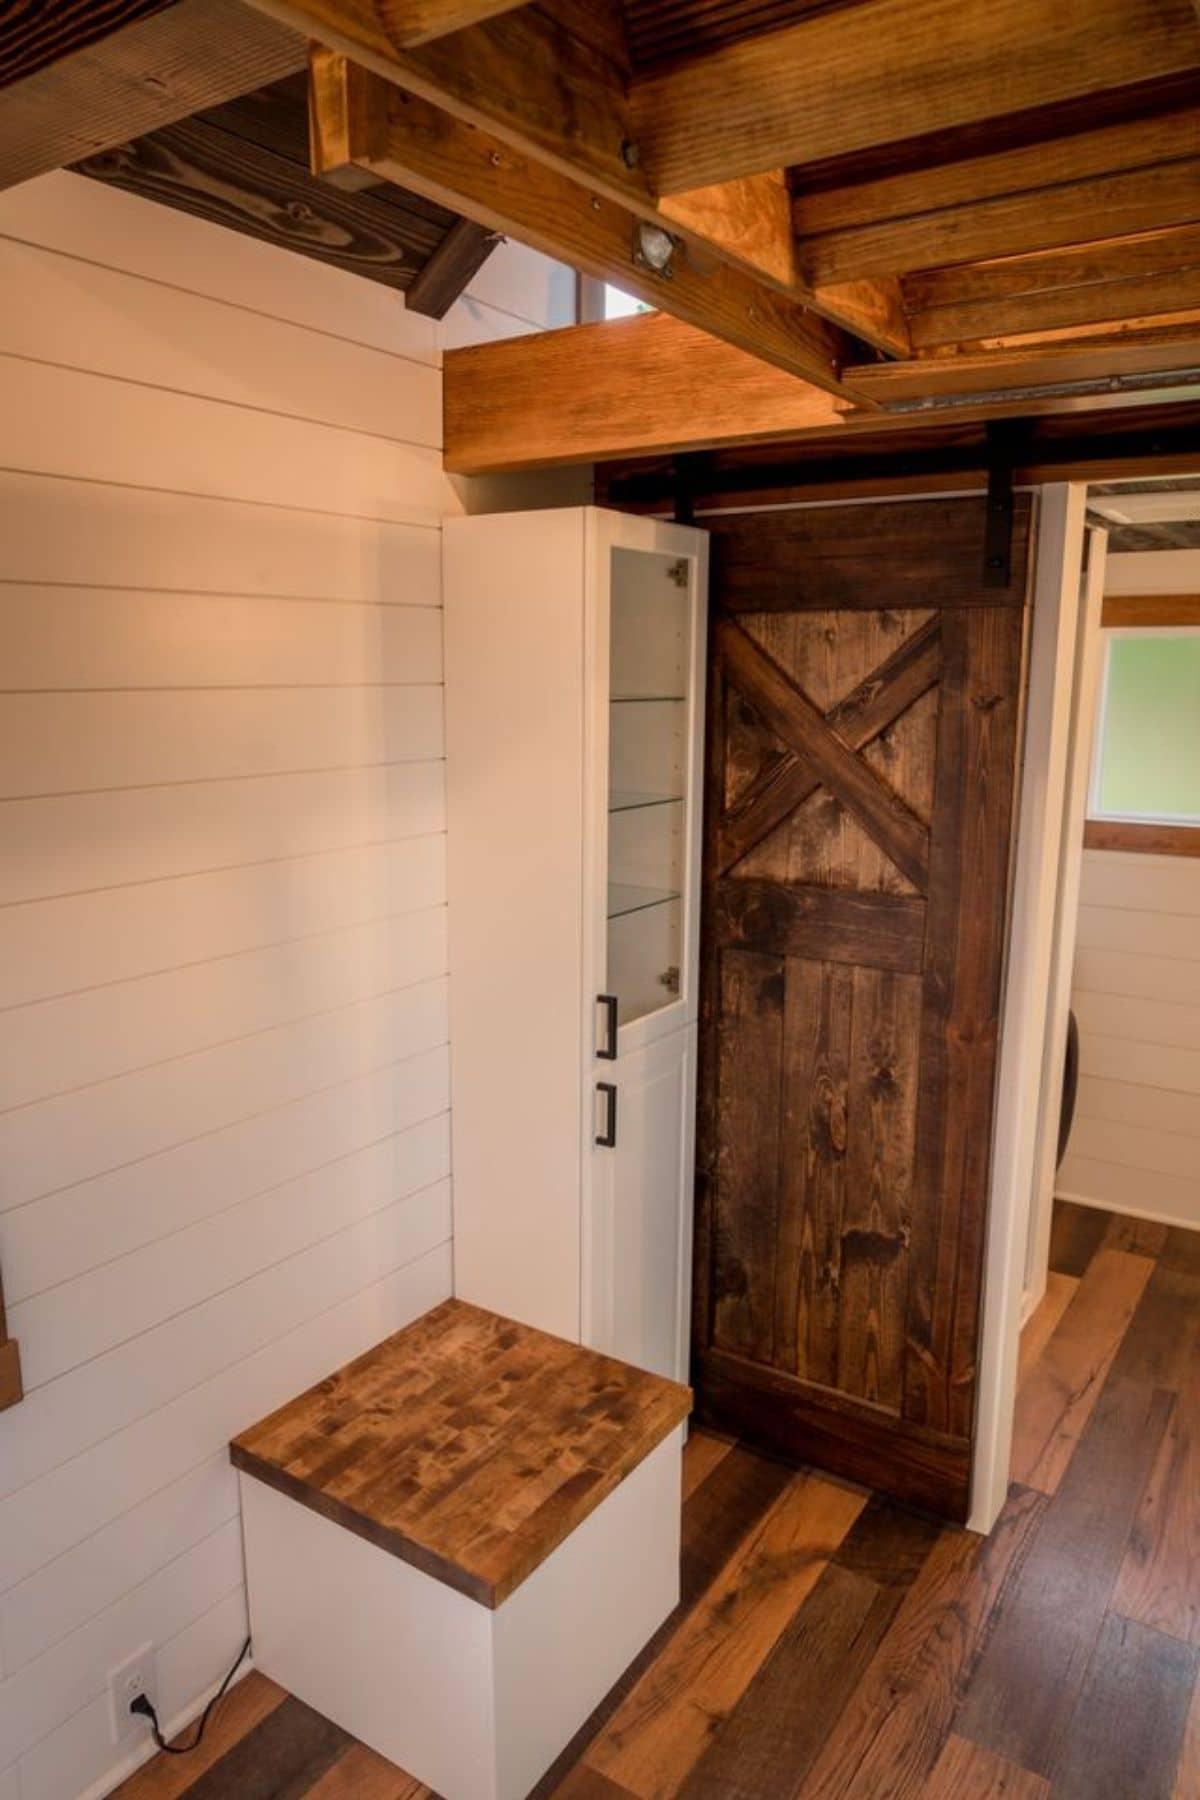 White cabinet next to dark wood barn door on white shiplap wall